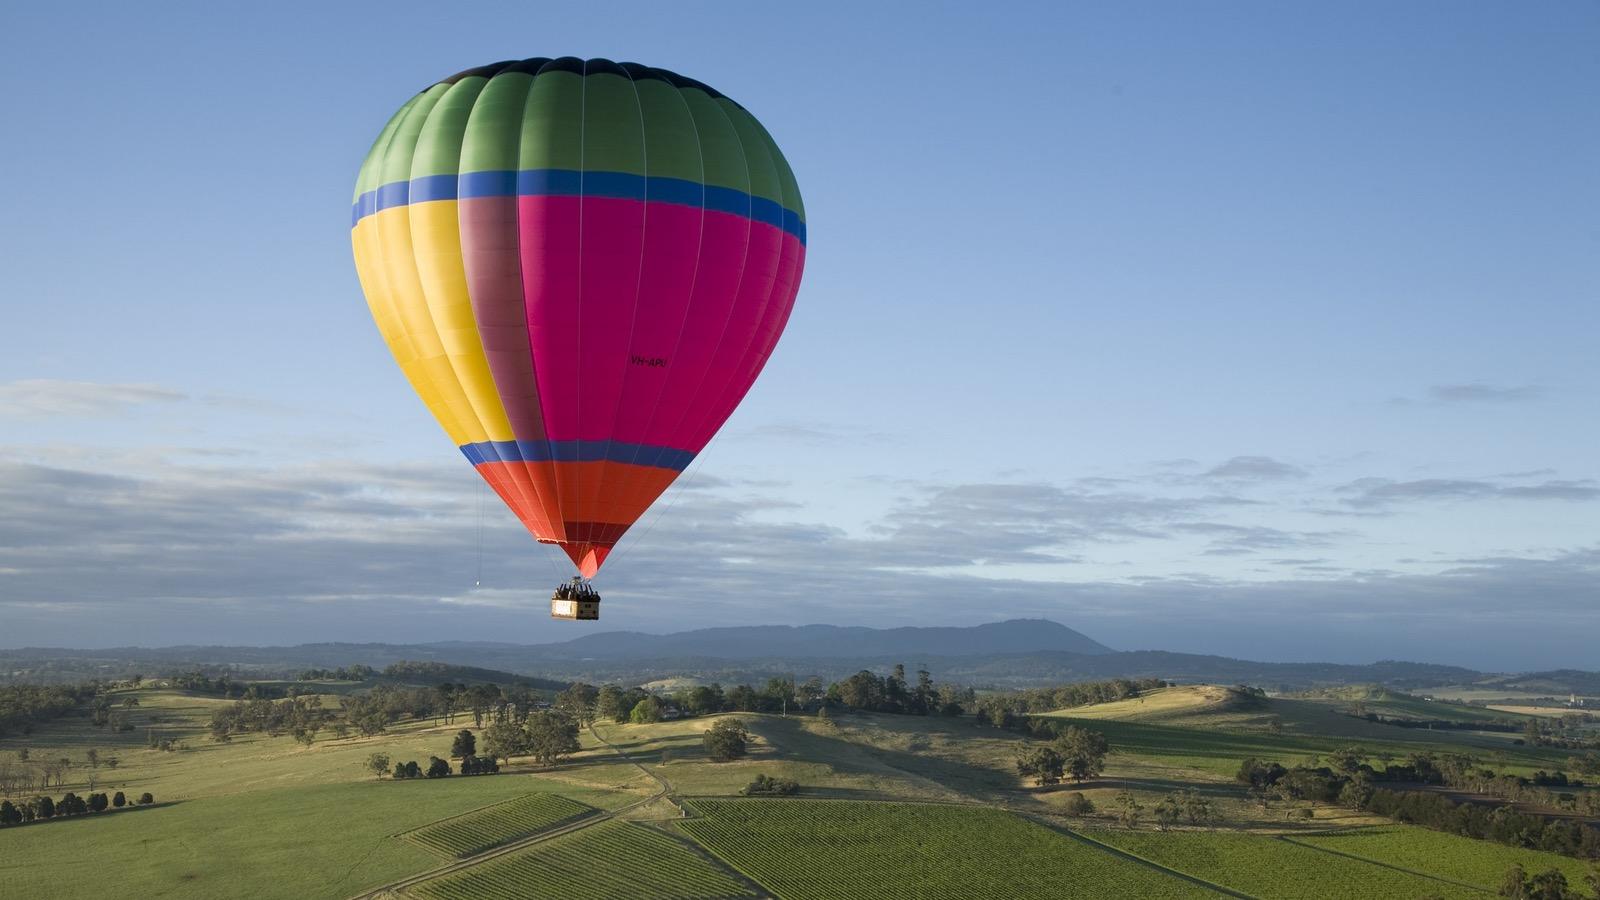 'Alawoonah' balloon